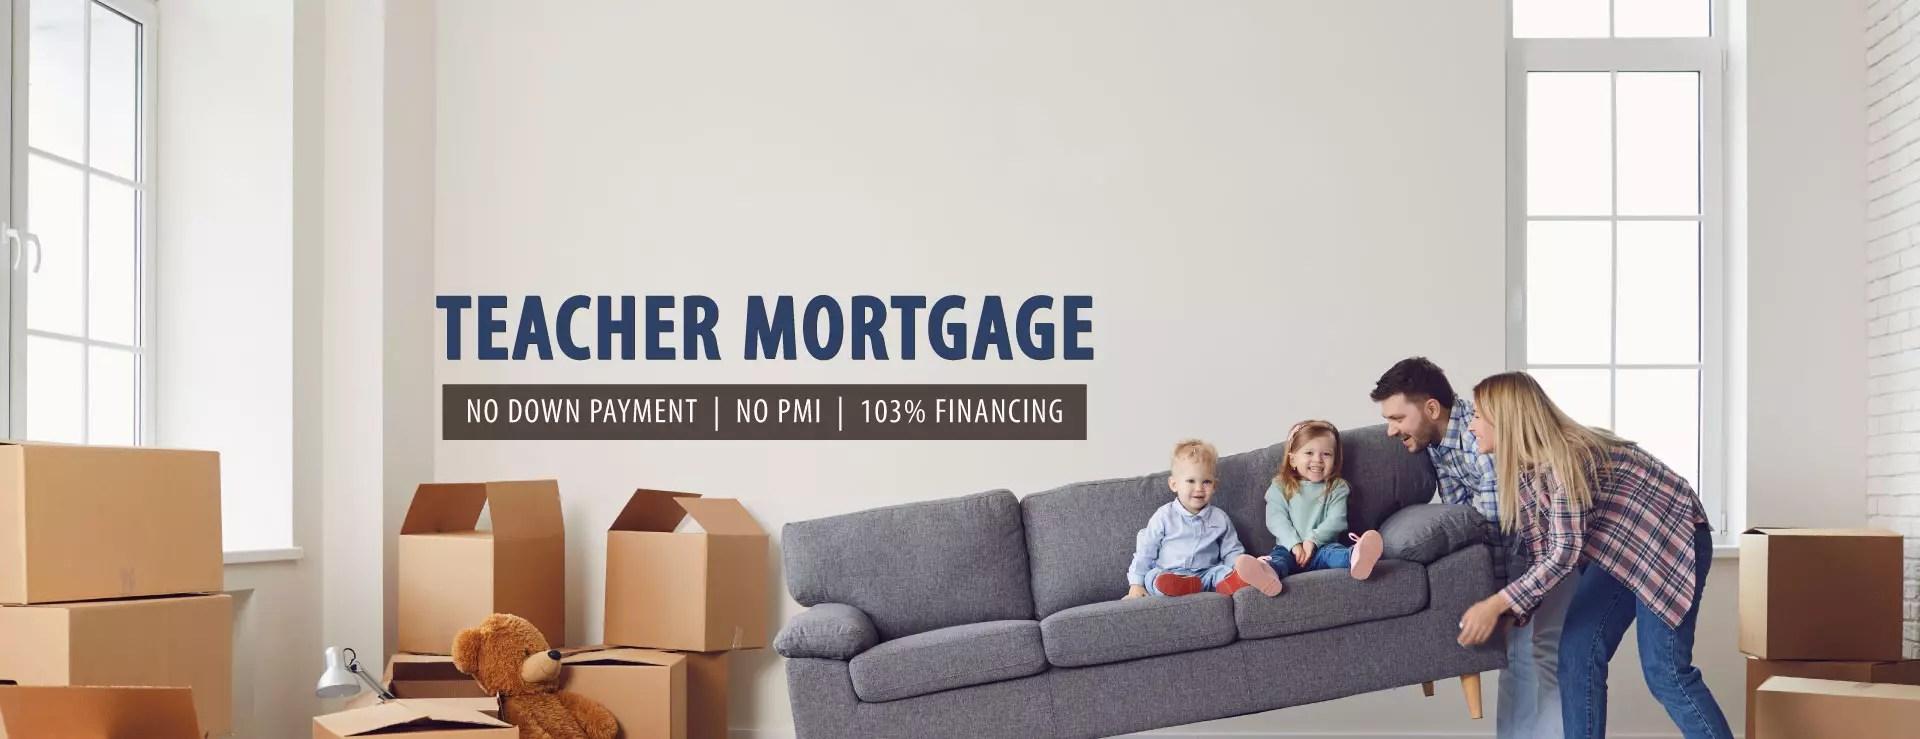 june-teacher-mortgage-web